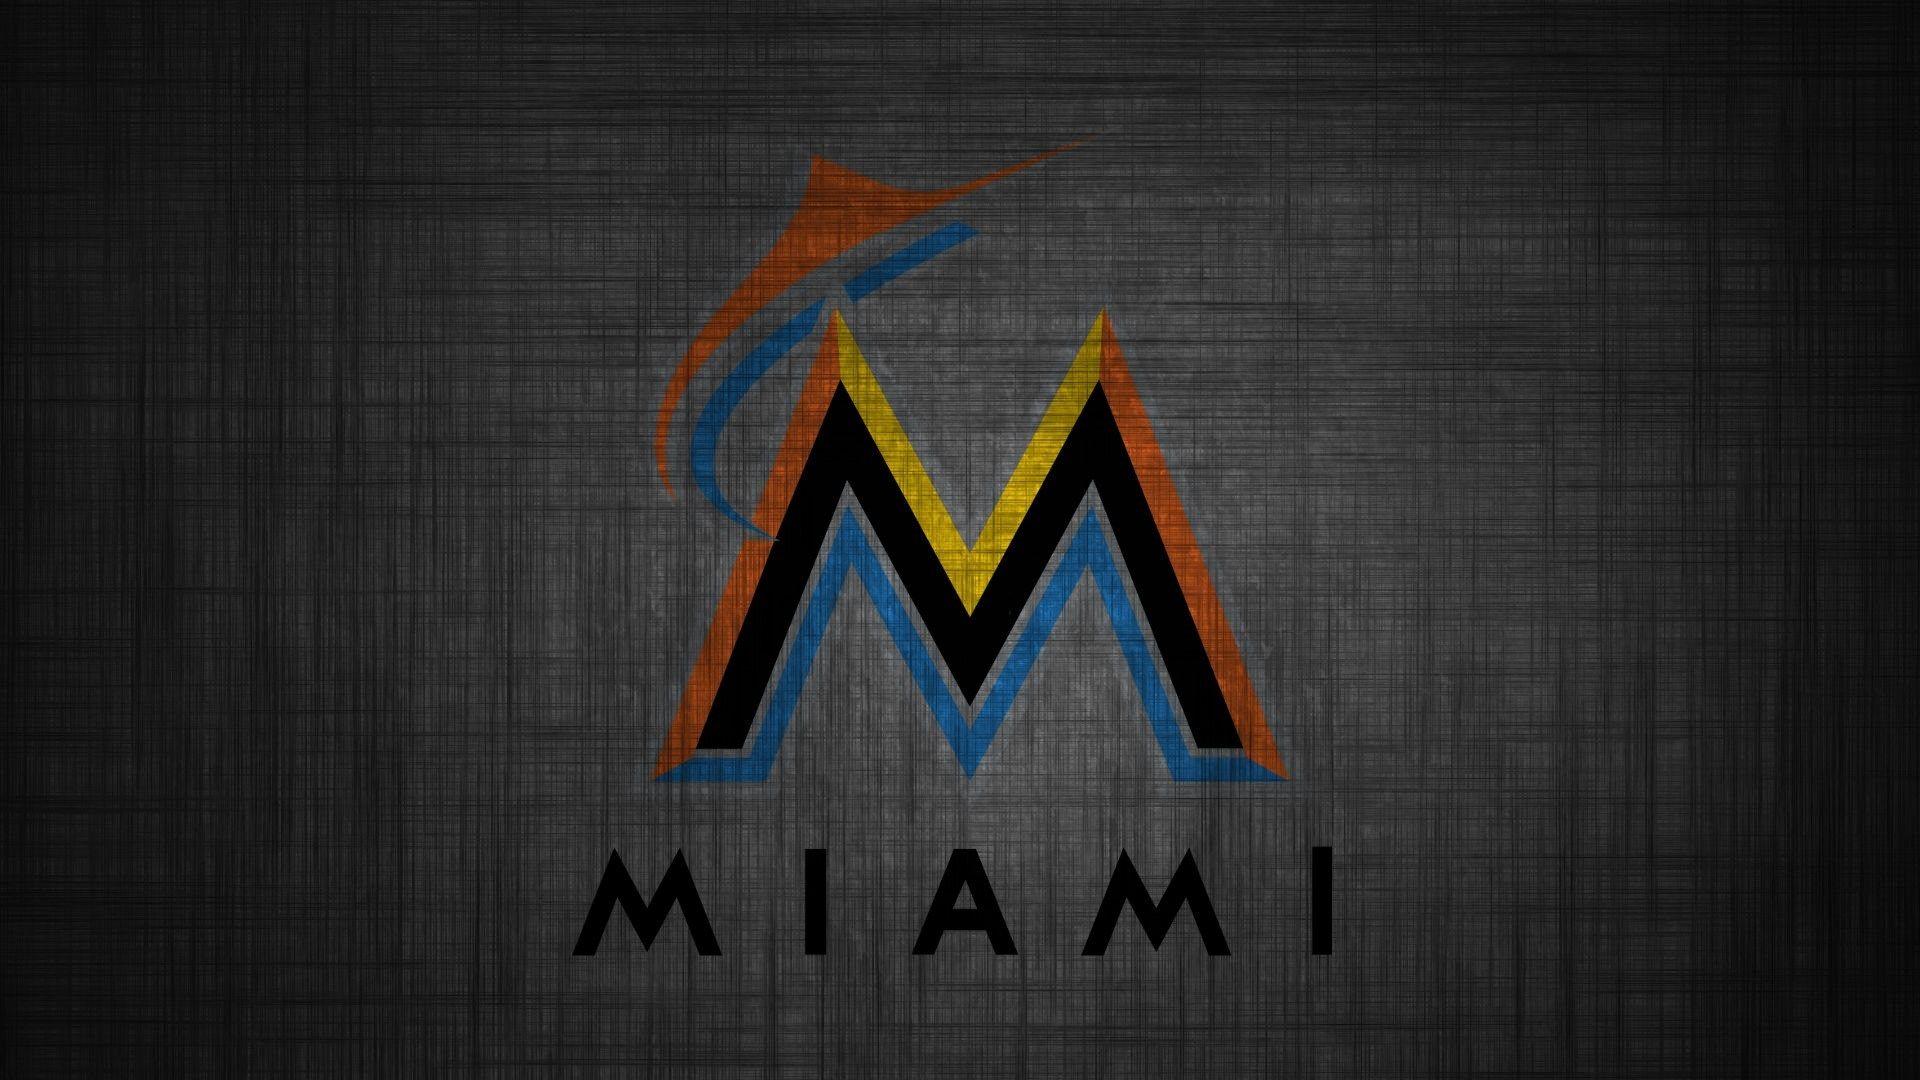 Miami Marlins Wallpapers Hd